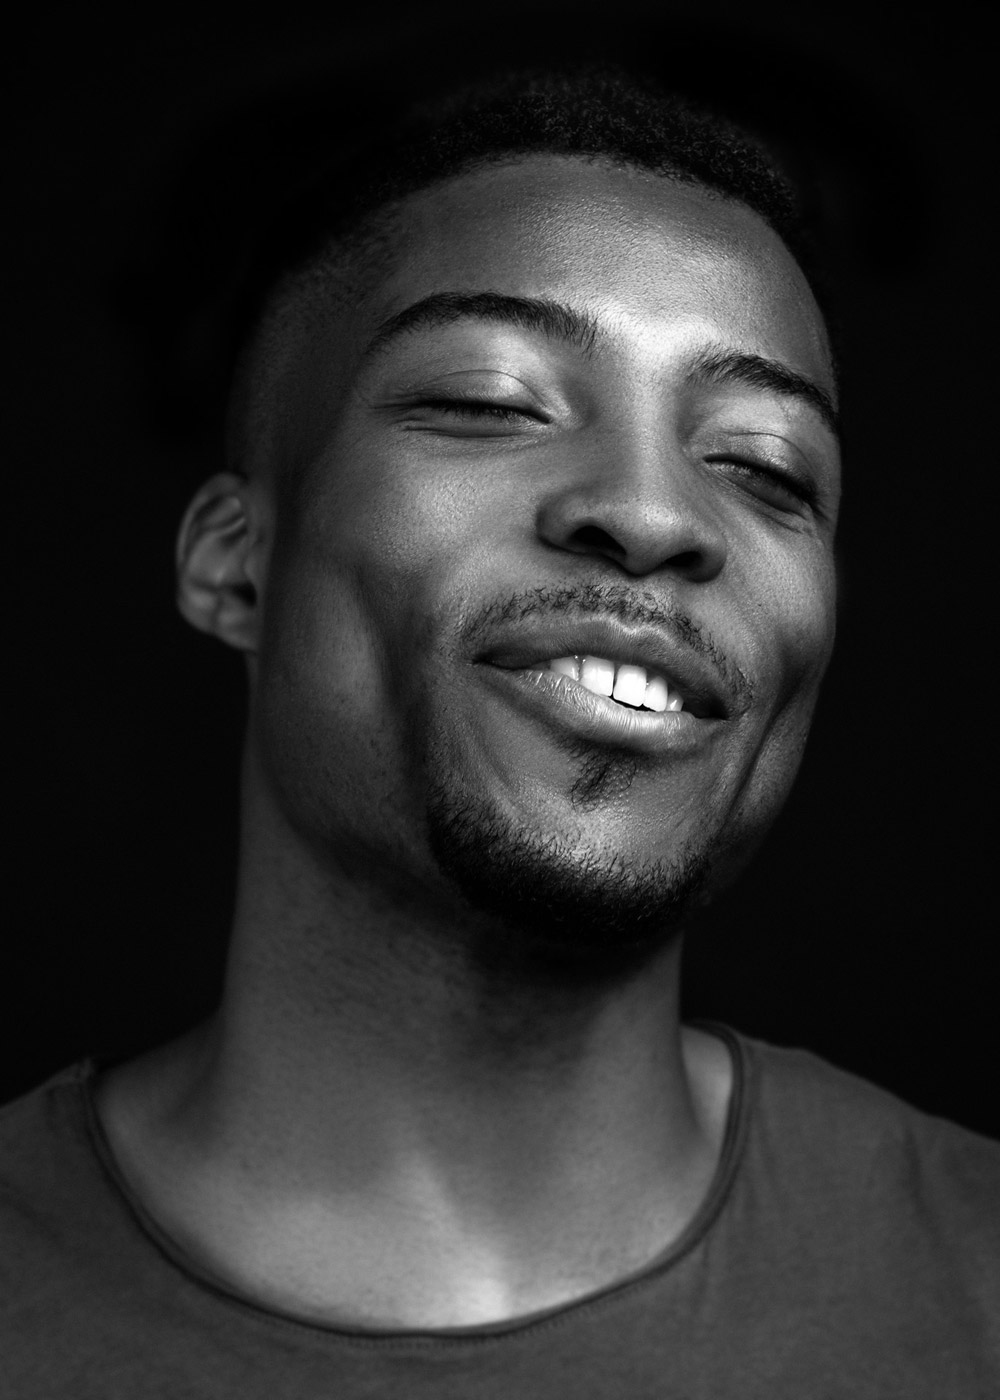 Marvin, © Alan Paul, Zurich, Amateur : Commercial/Editorial/Assignment, PDN Faces - Portrait Photography Contest